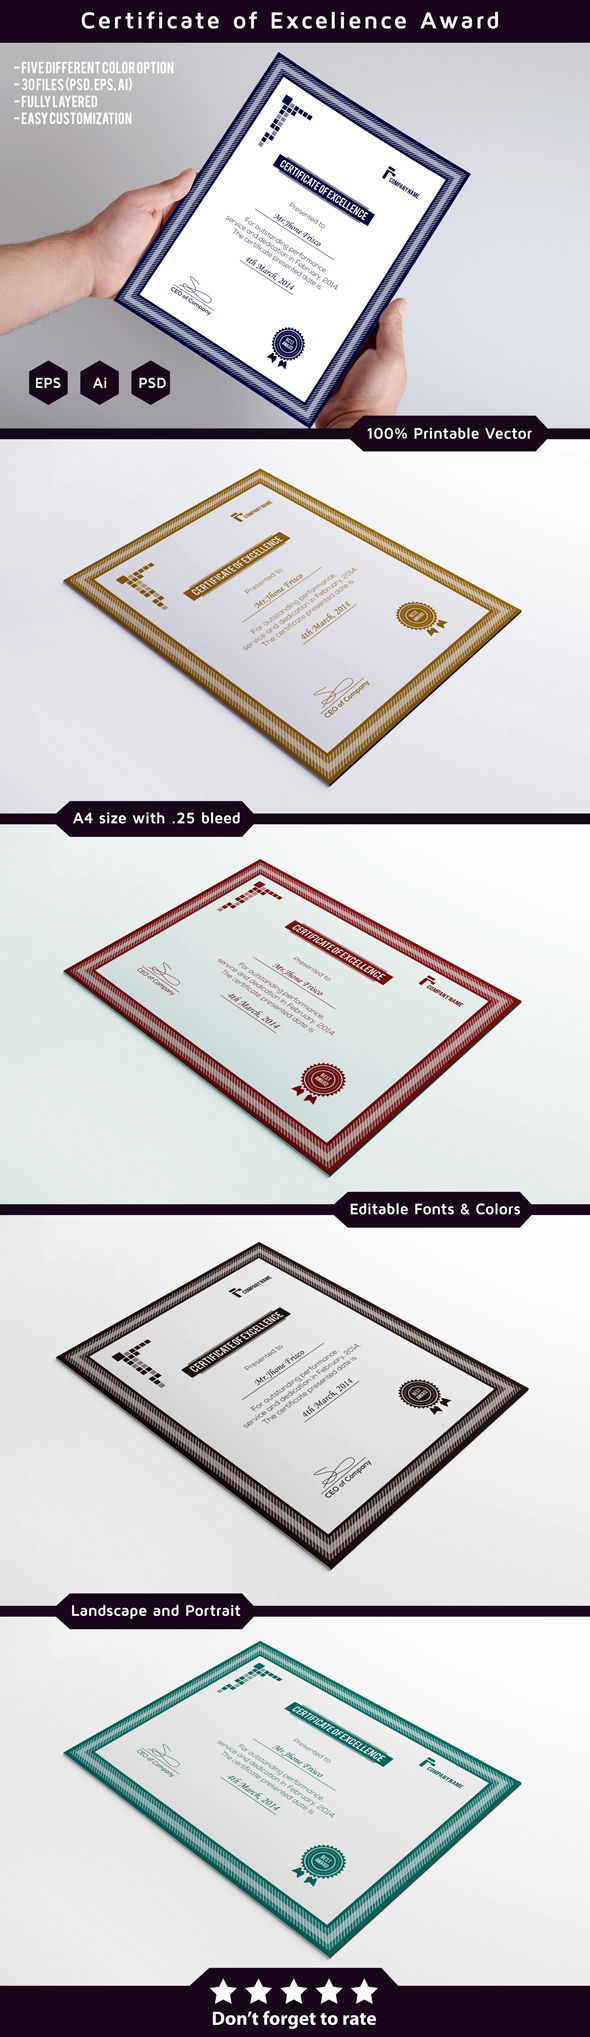 Award Certificate Template  DiplomInspirasjon